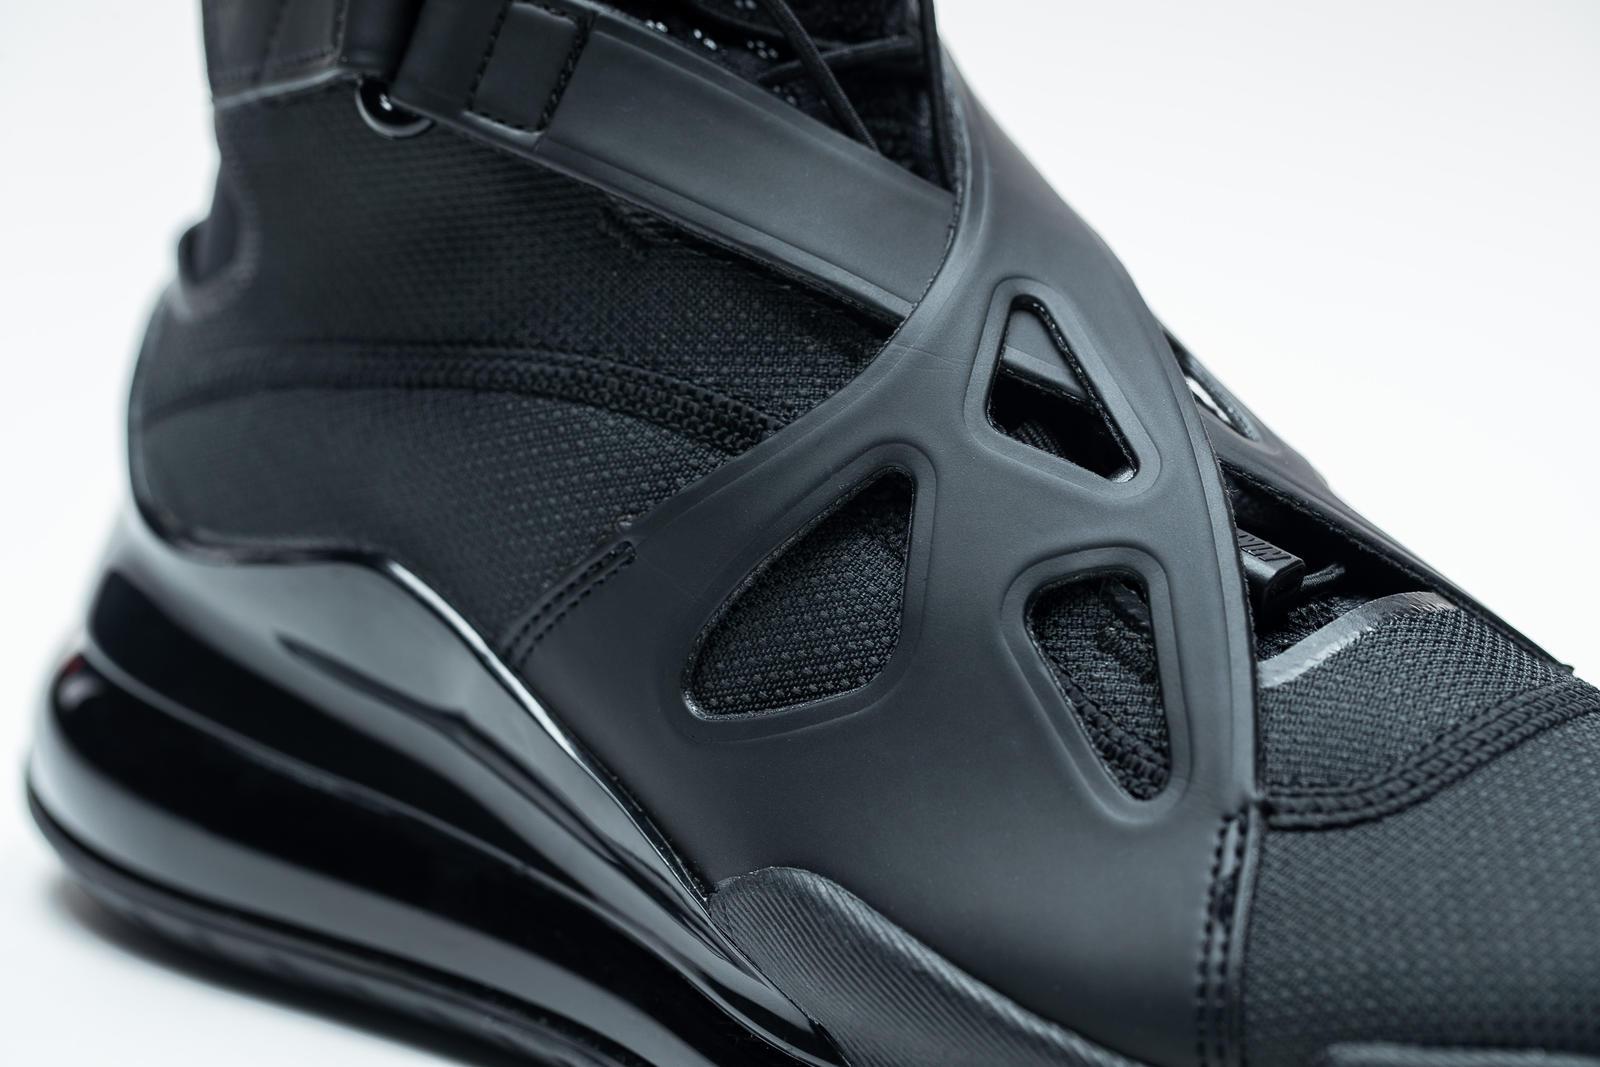 36facdb8e2b Introducing the Nike Adapt BB - Nike News